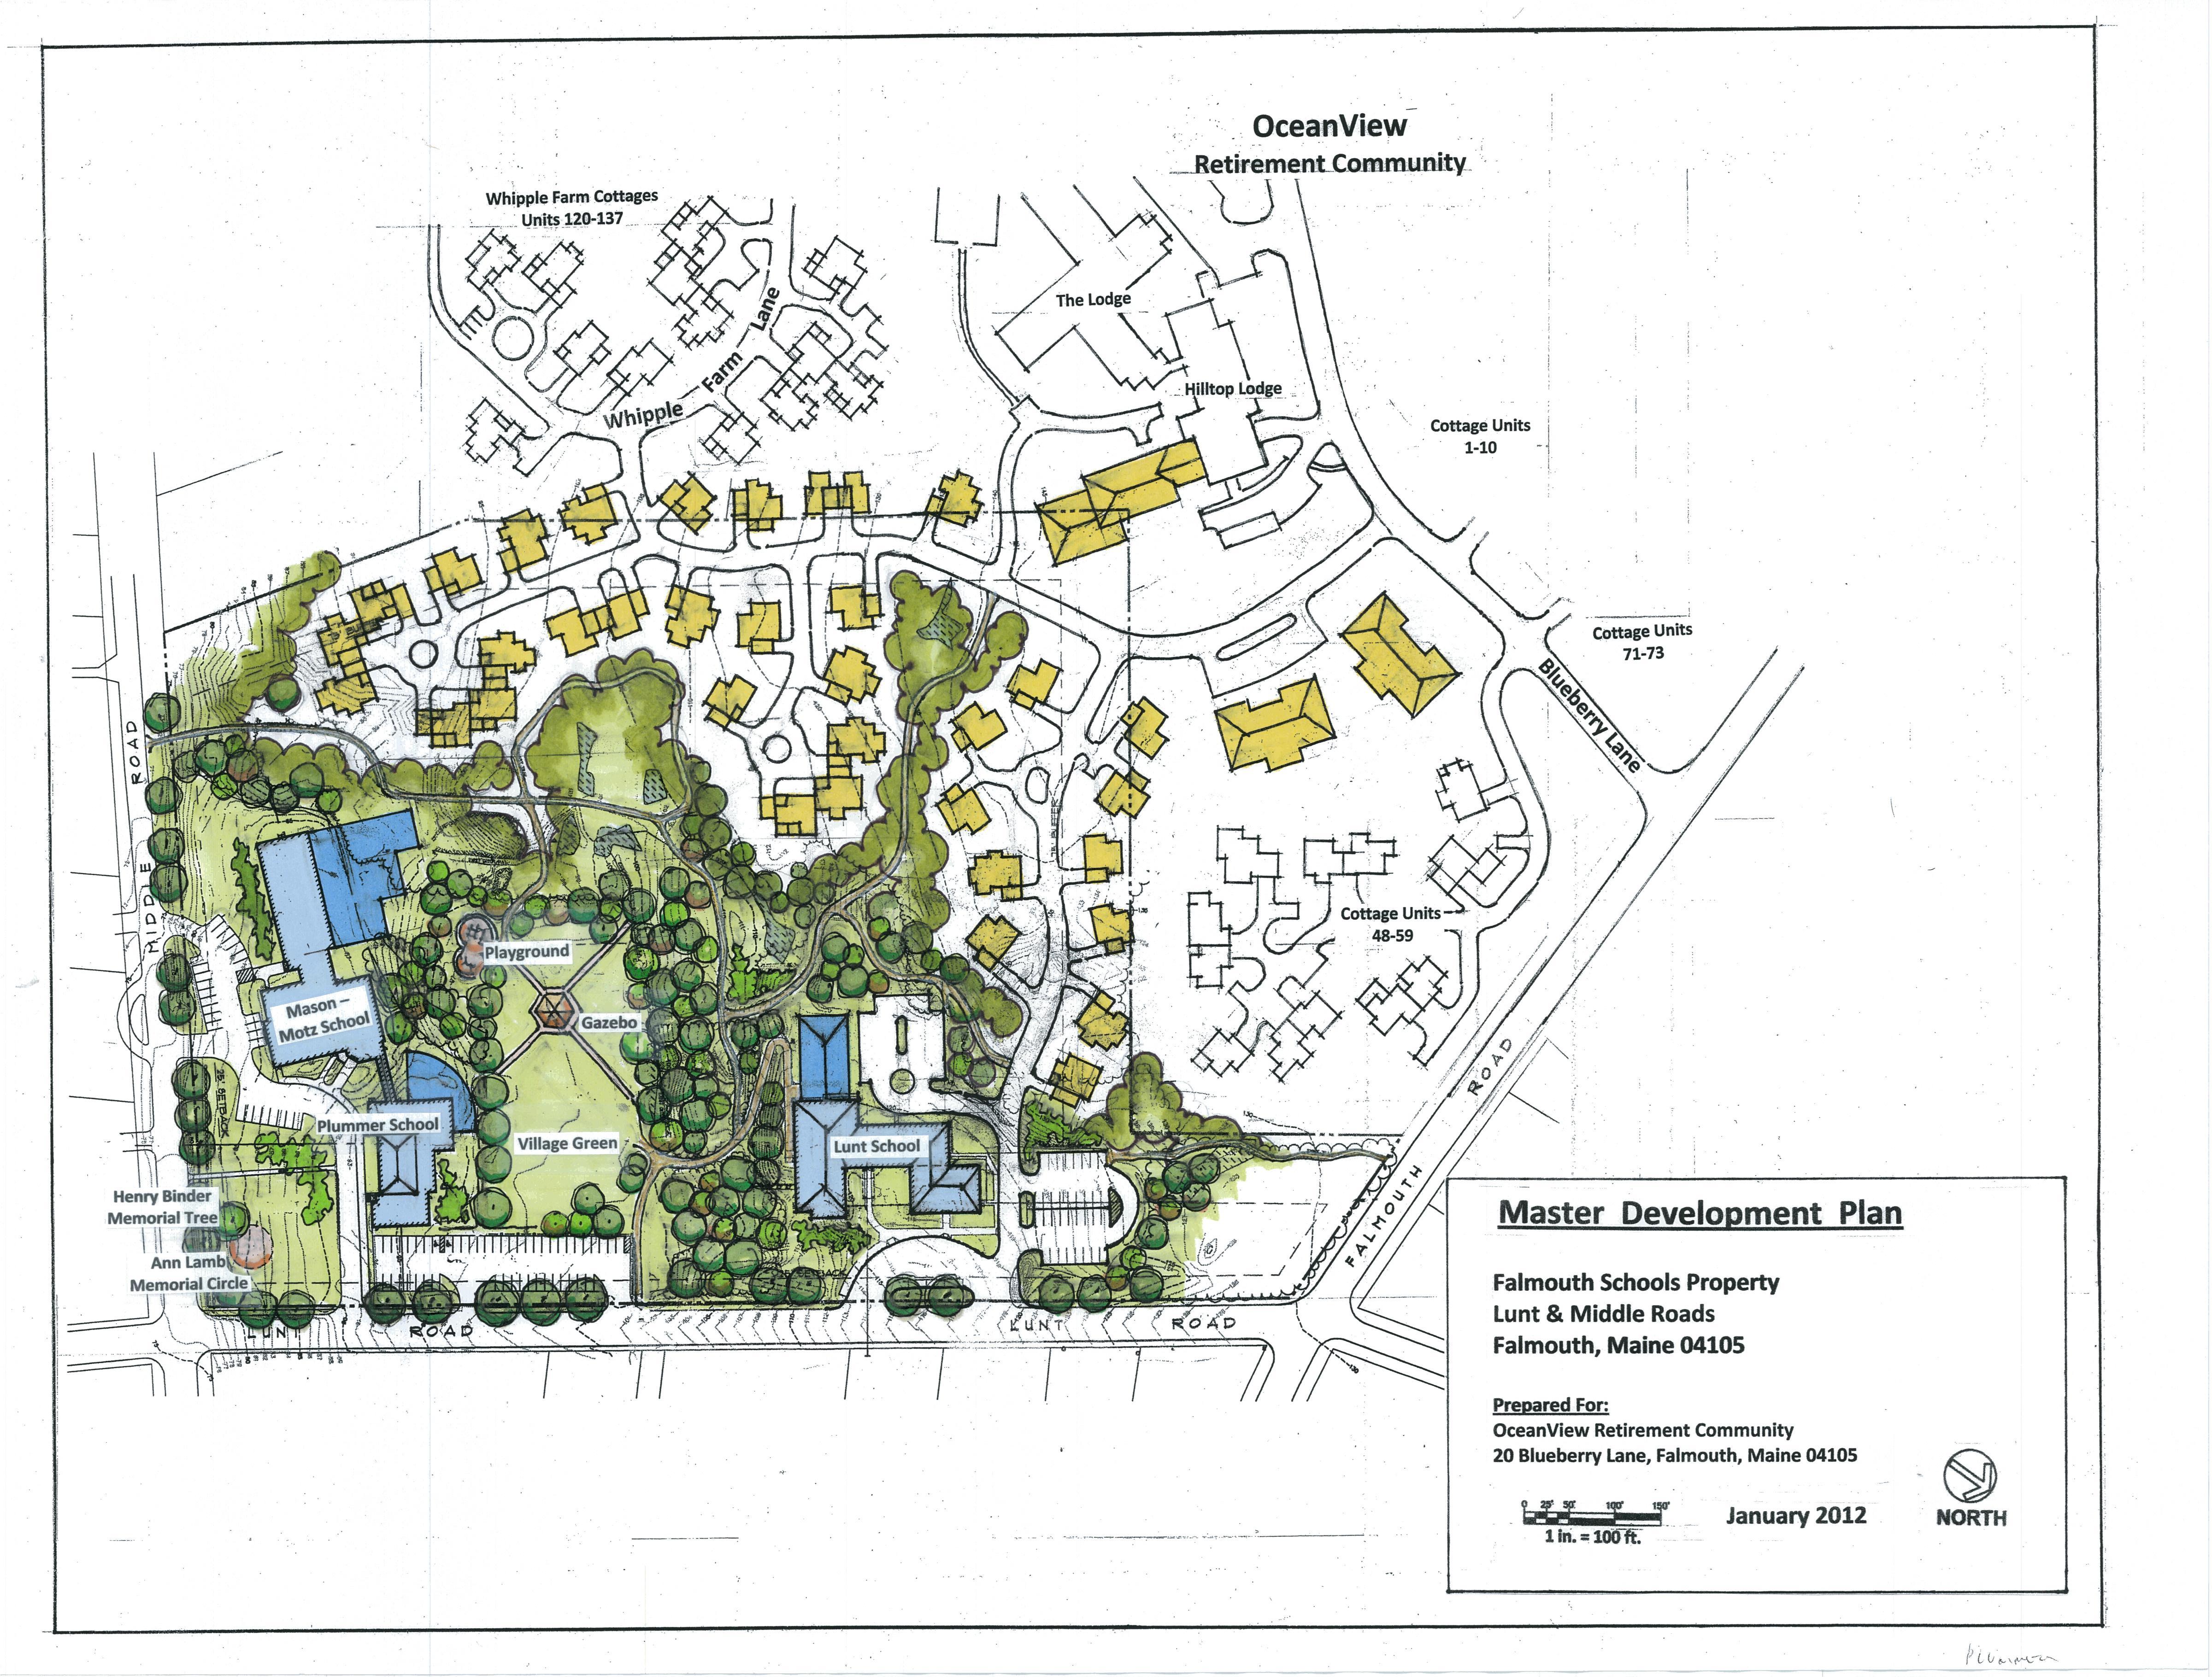 OceanView Falmouth Schools Property Master Development Plan